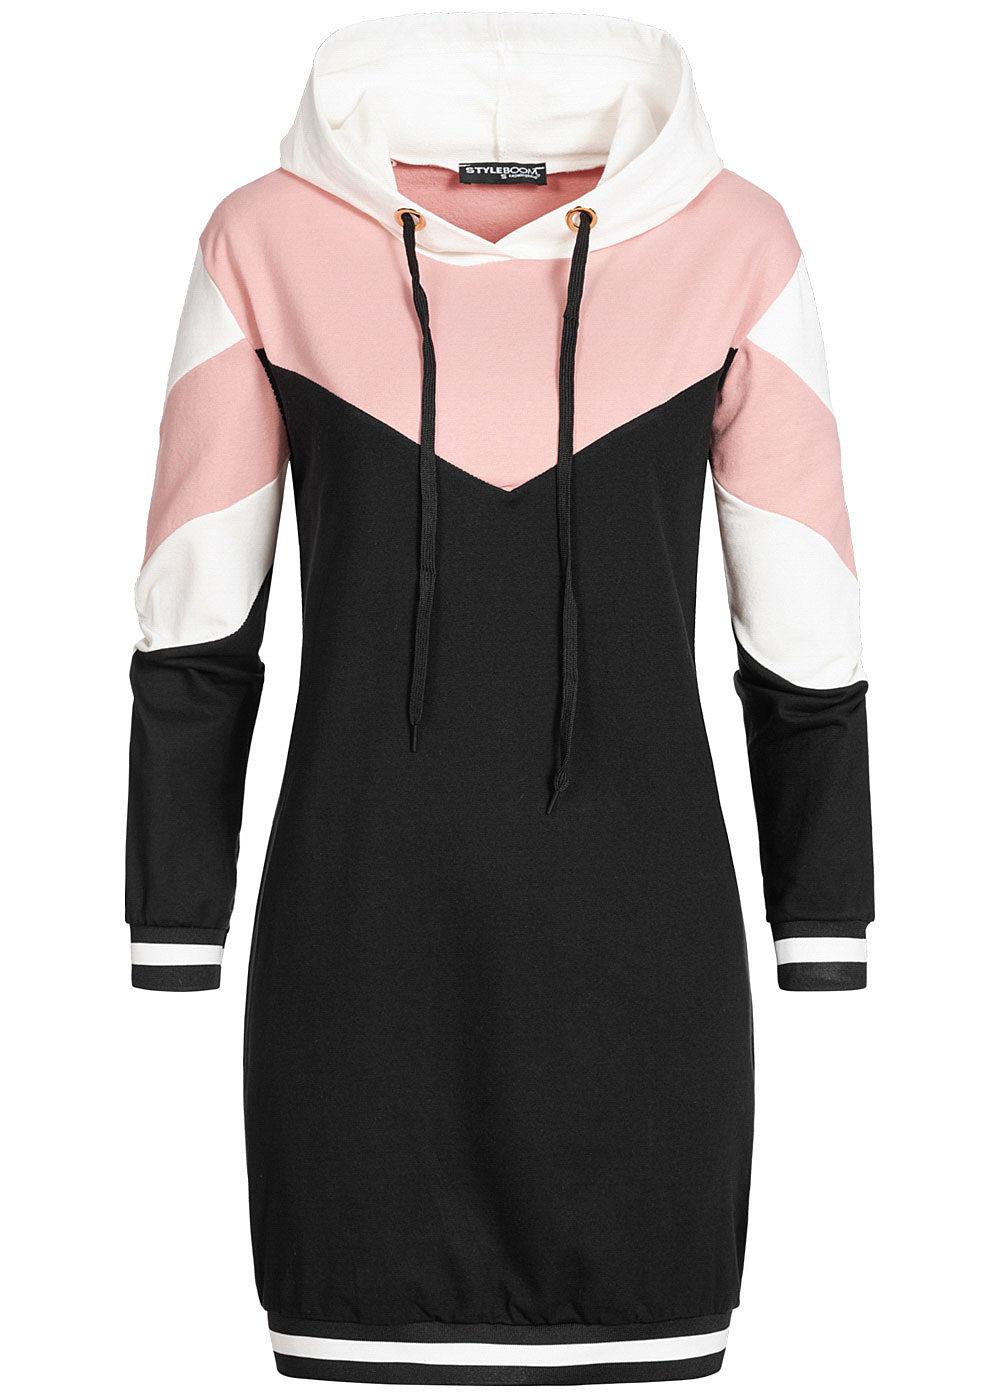 Styleboom Fashion Damen Colorblock Hoodie Kleid Kapuze weiss